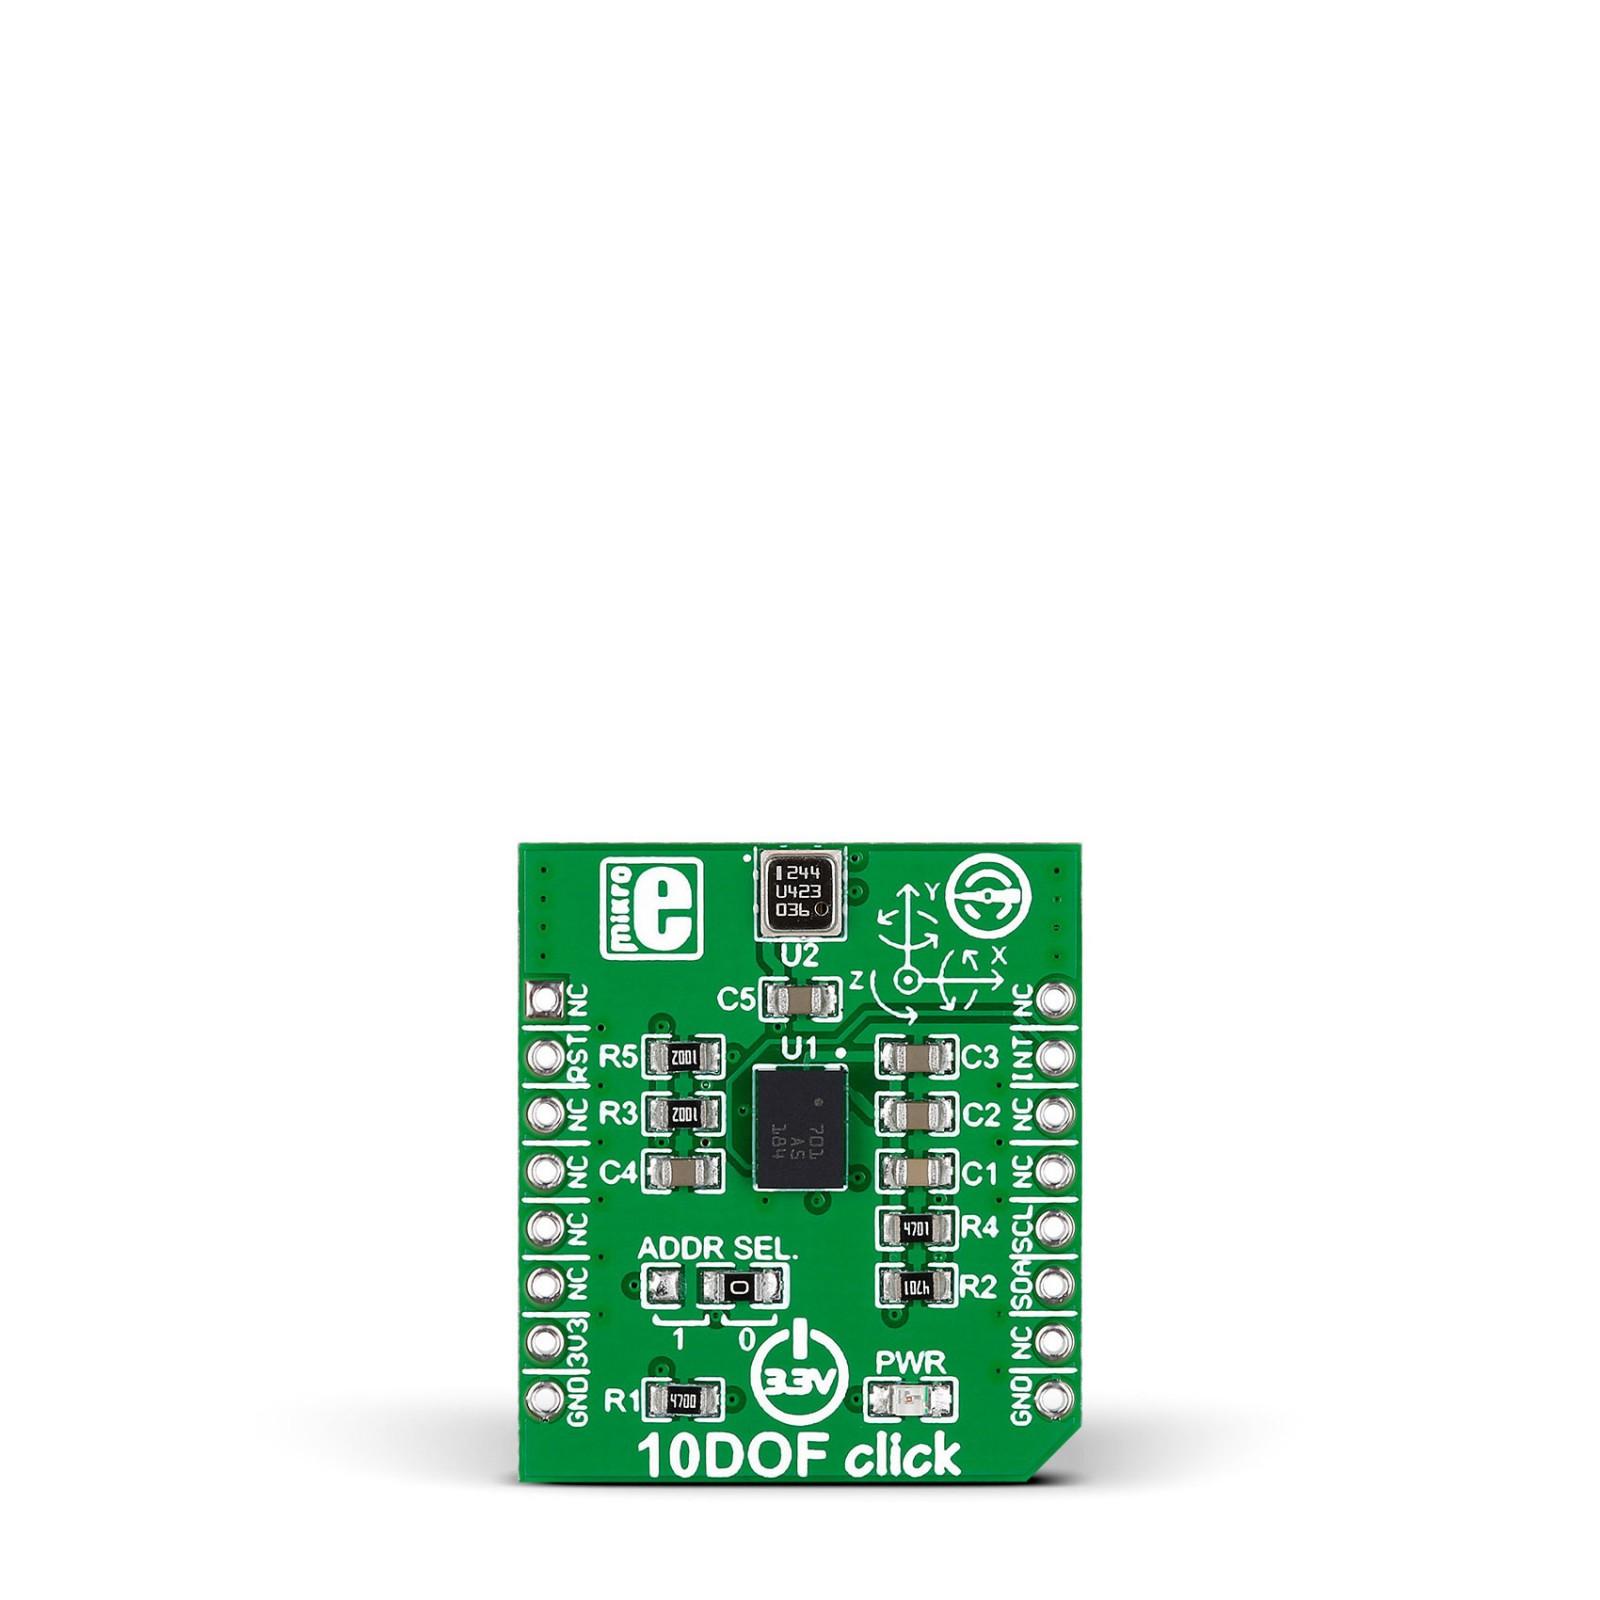 10DOF Click | MikroElektronika